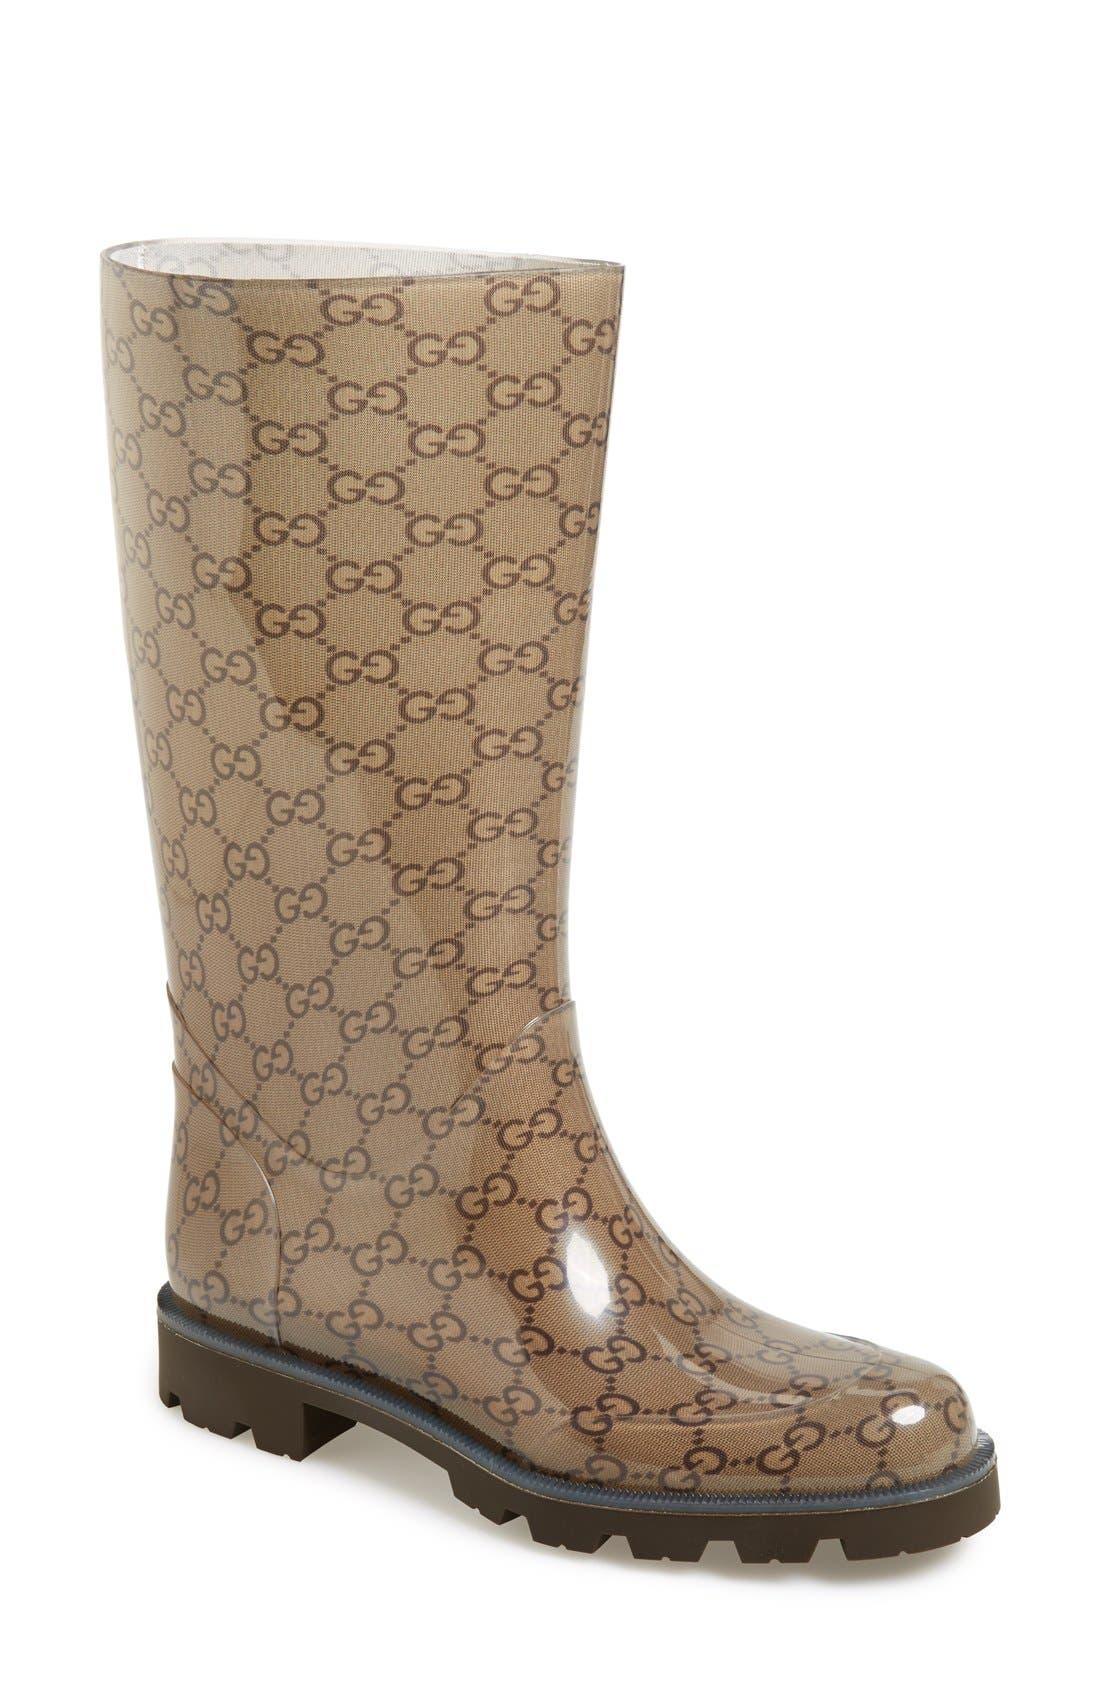 Alternate Image 1 Selected - Gucci 'Edimburg GG' Rain Boot